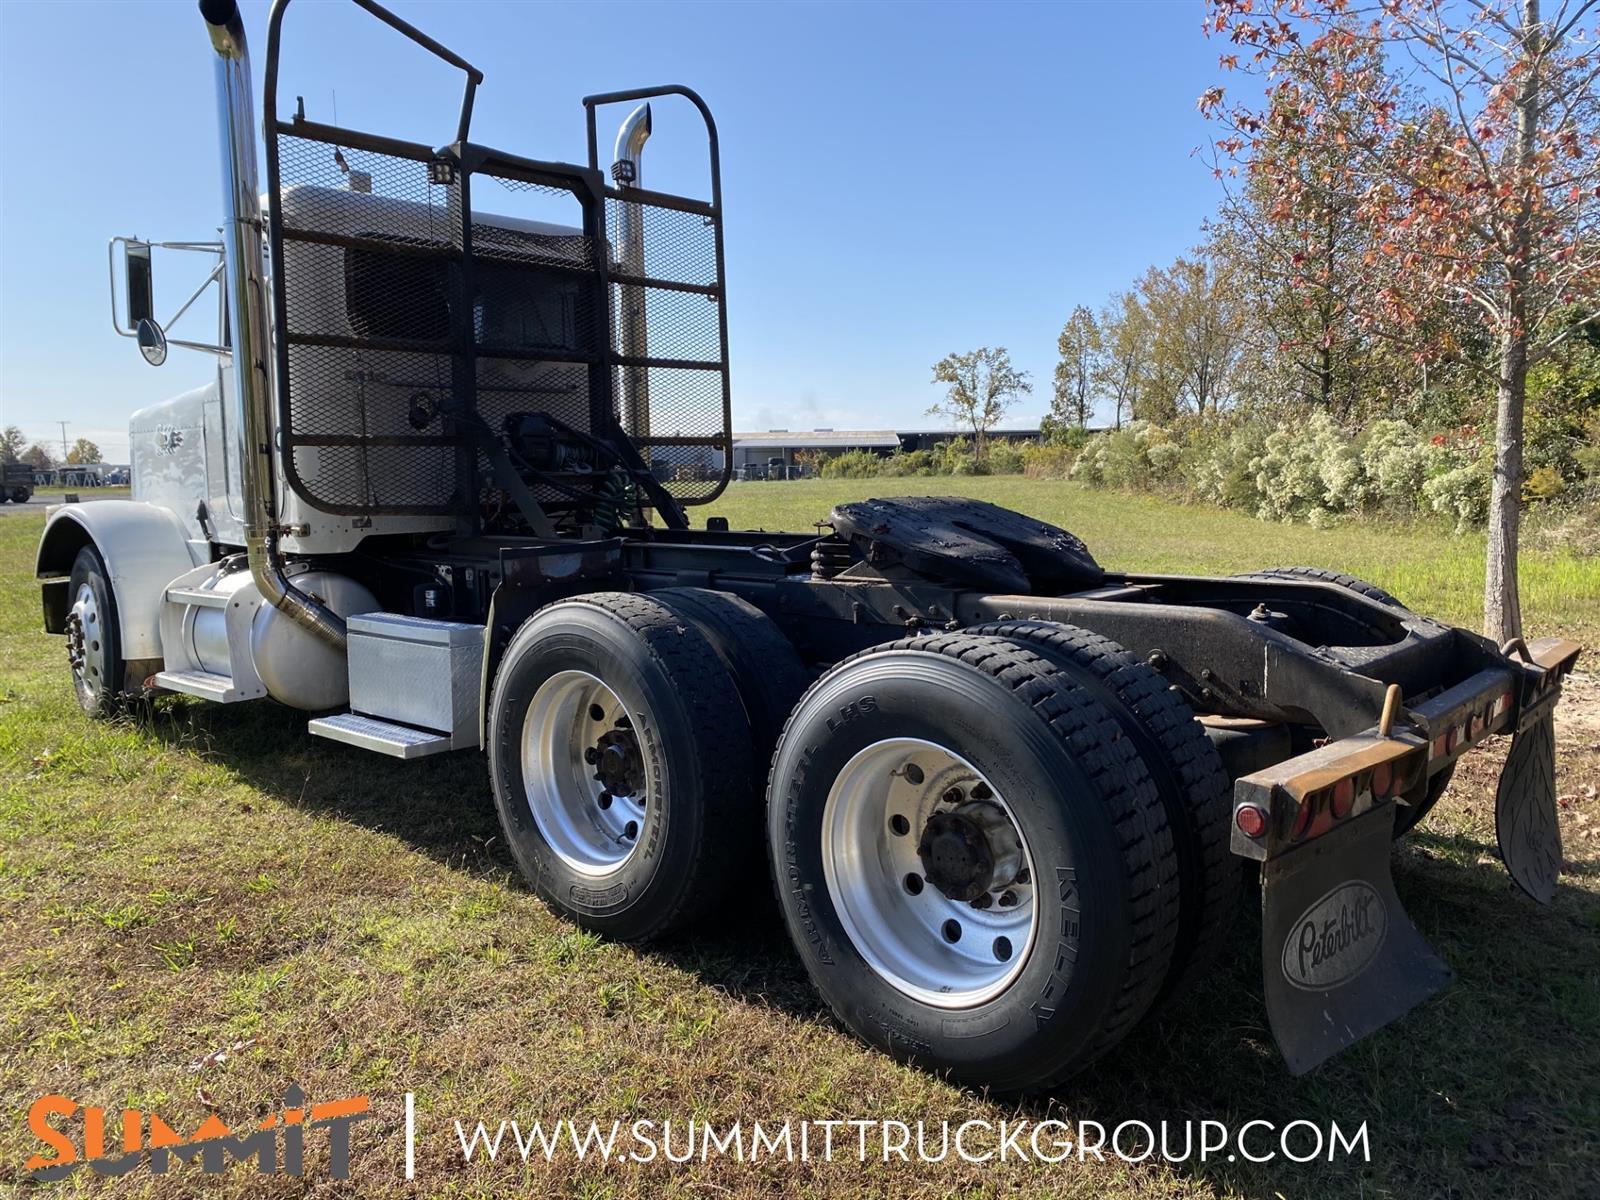 1997 Peterbilt Truck Day Cab 6x4, Tractor #210T202023 - photo 1